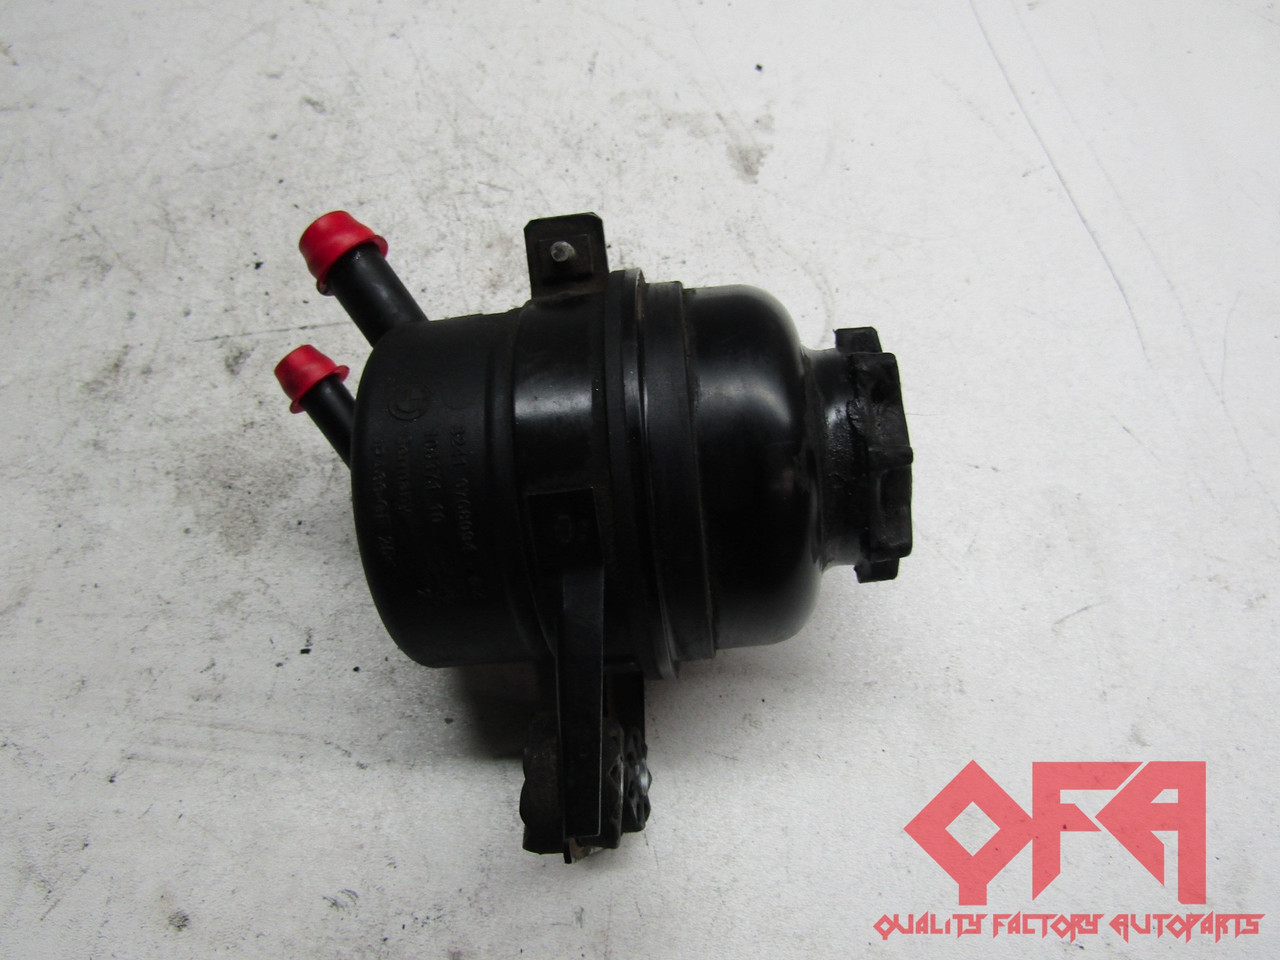 2008 bmw 335i e90 power steering fluid reservoir 32416768094 quality factory autoparts qfaparts com